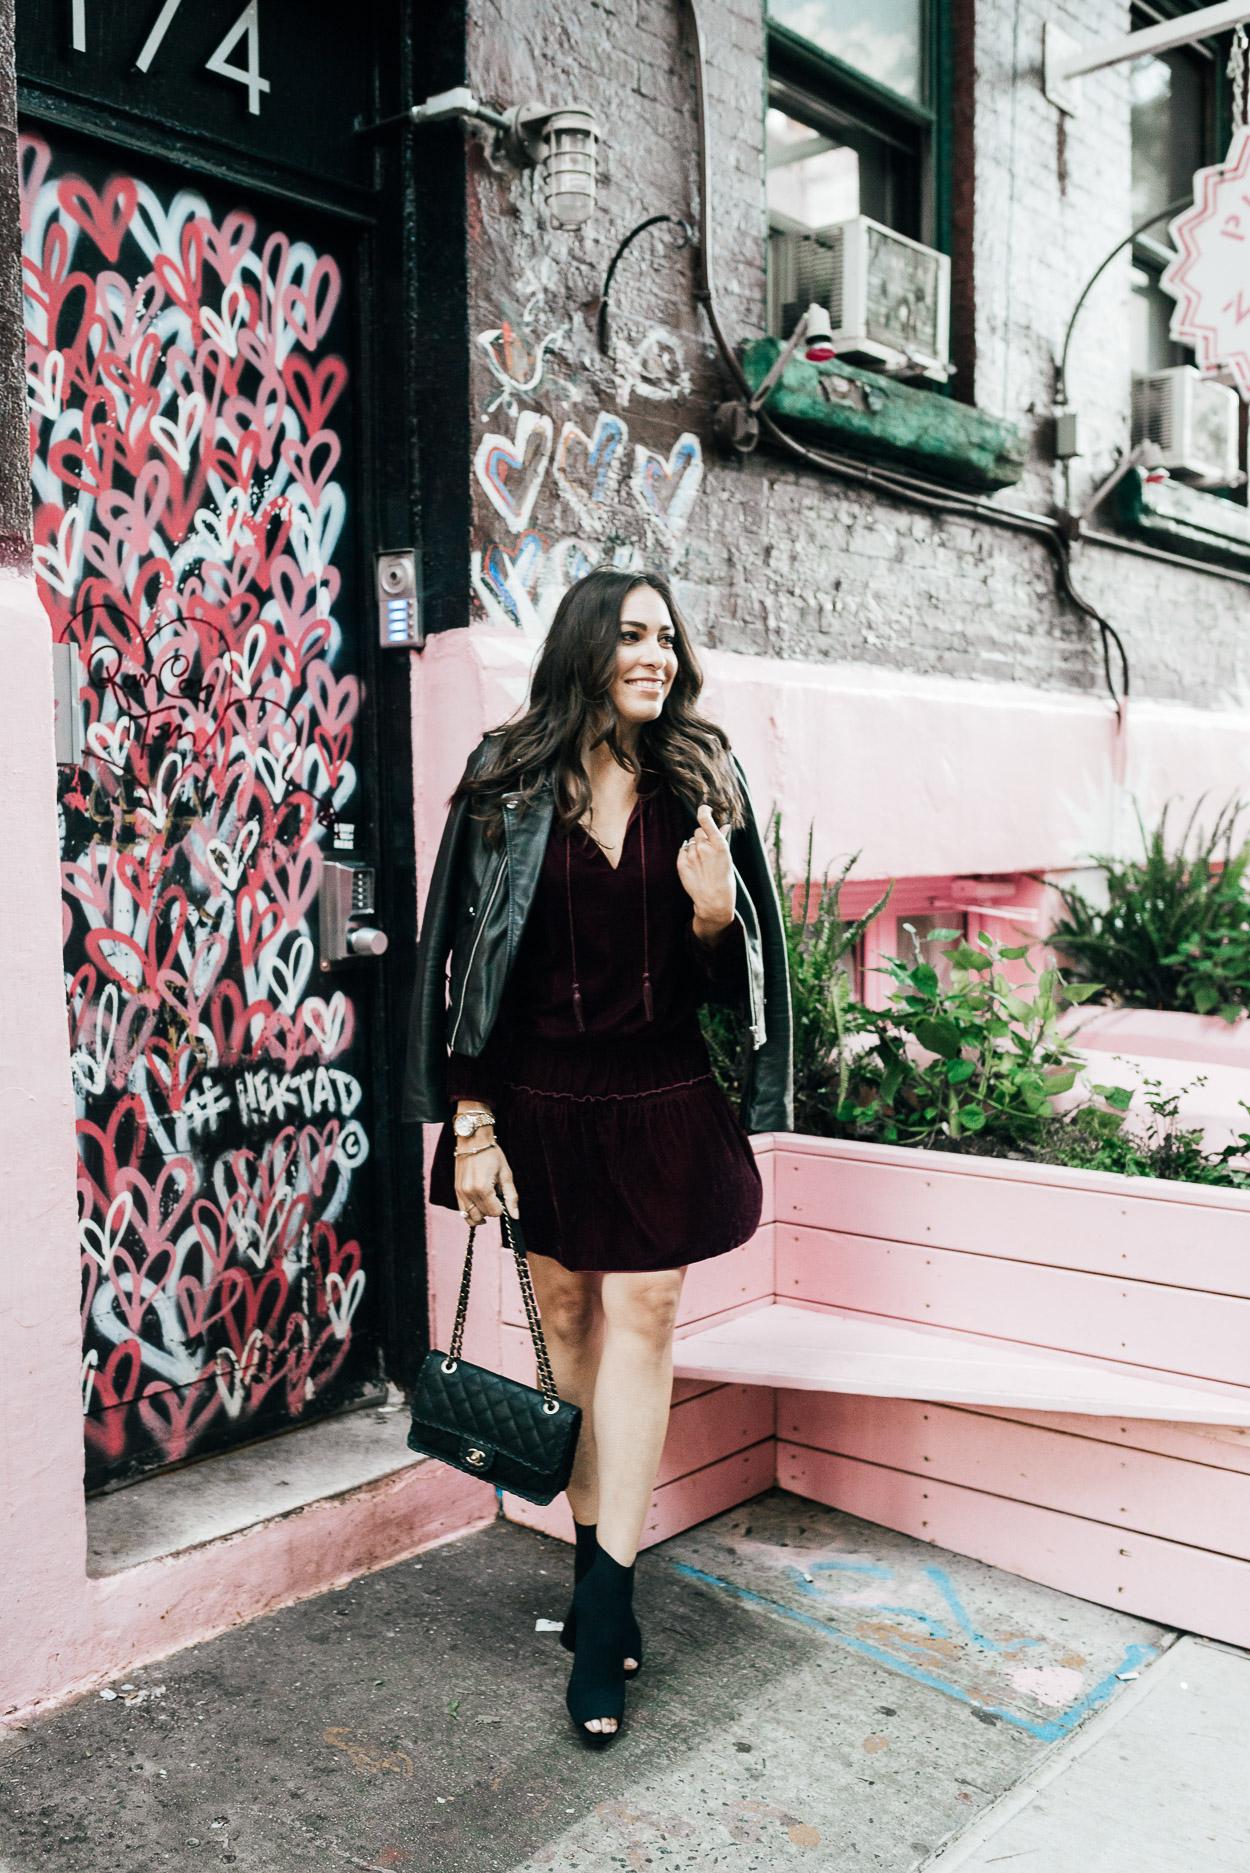 AGlamLifestyle blogger visits NYC hotspot Pietro Nolita wearing Ella Moss dress for the velvet dress trend during NYFW